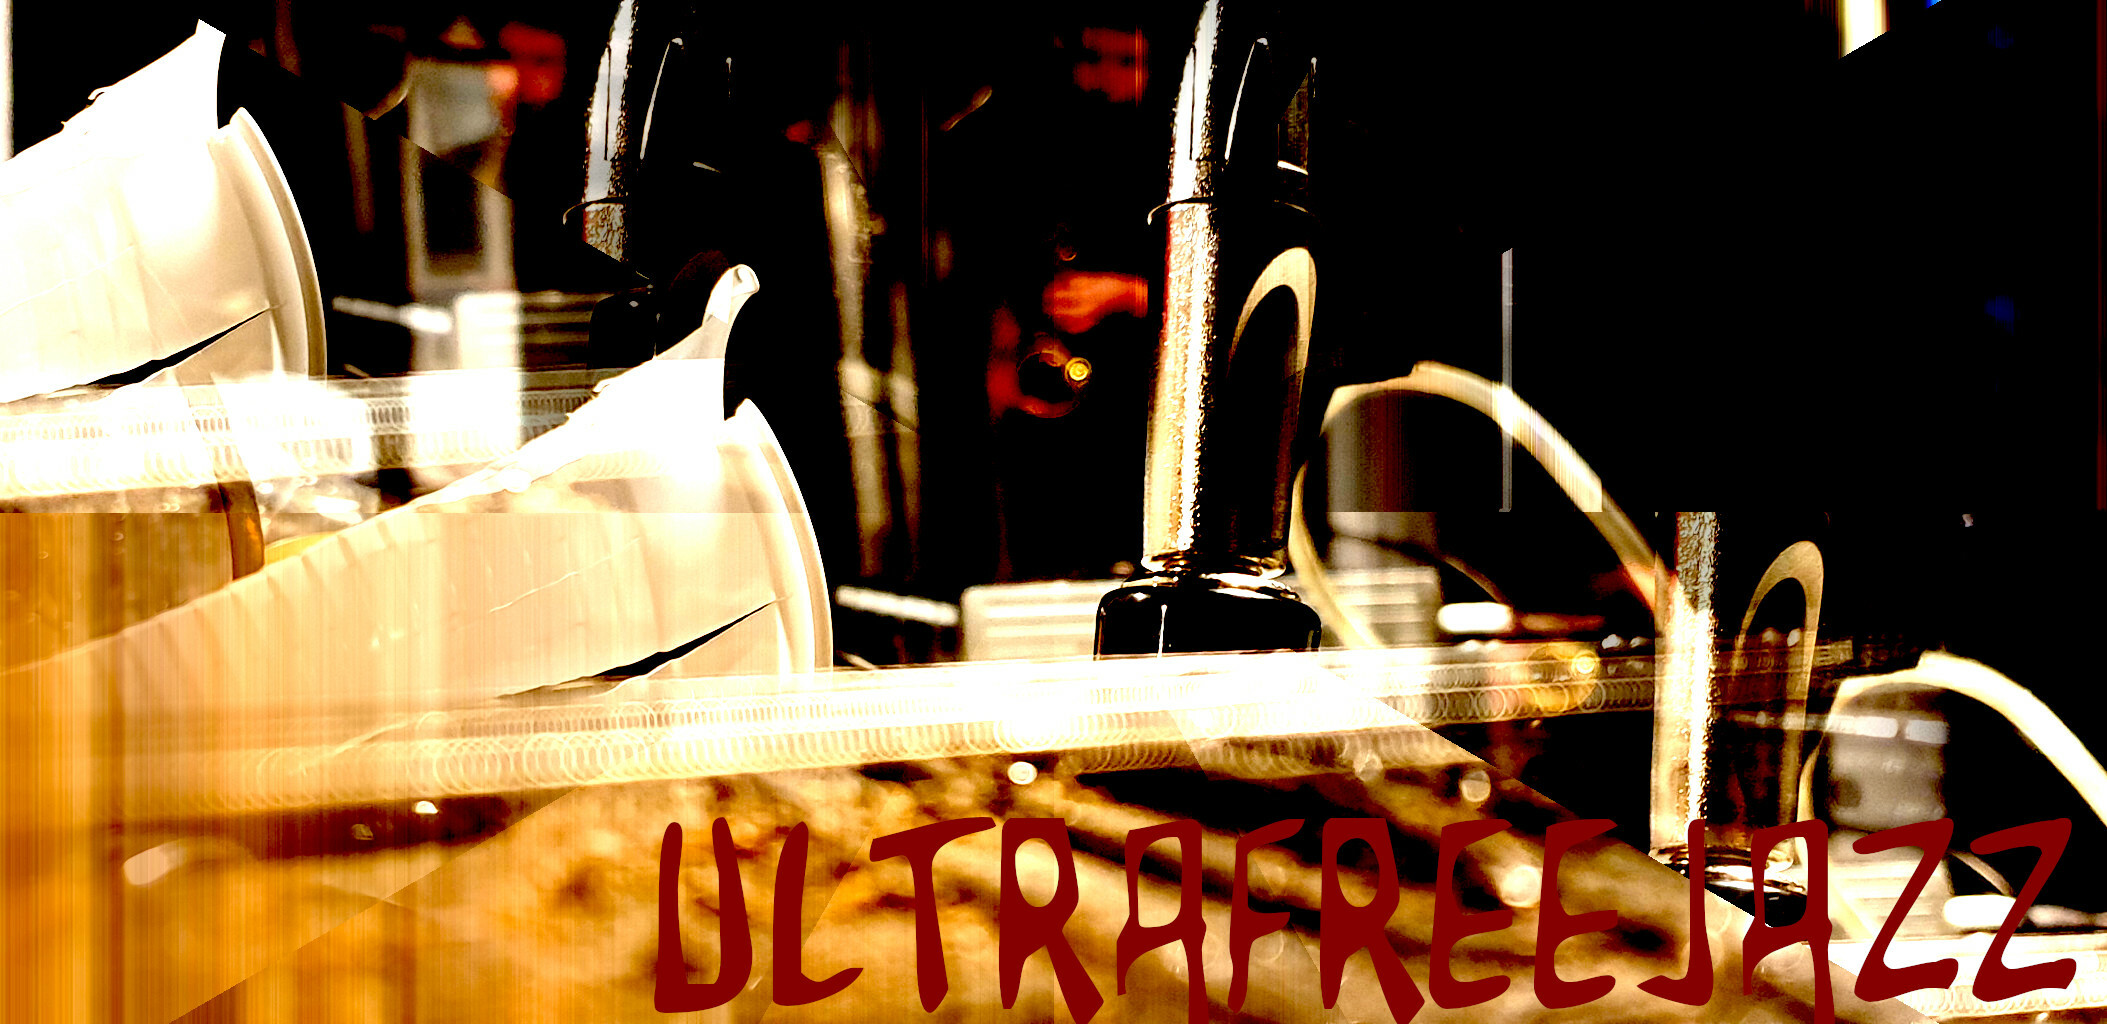 UltraFreeJazz Night #3